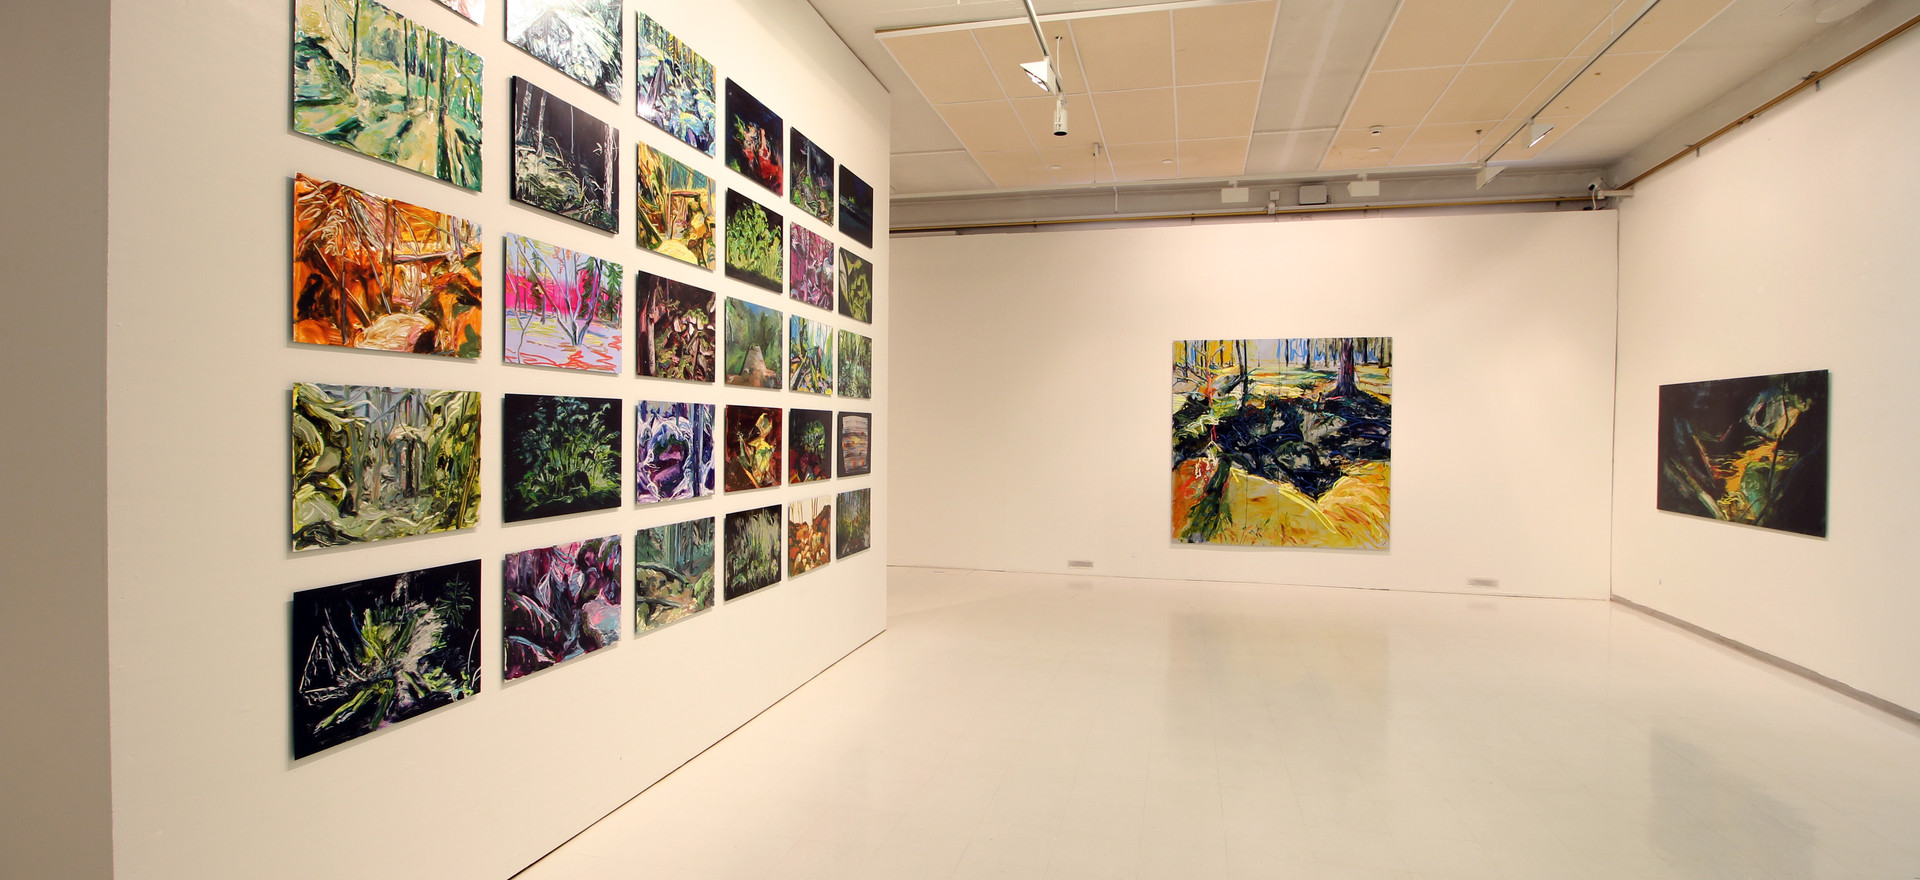 Mältinranta Art Center, Gallery 7